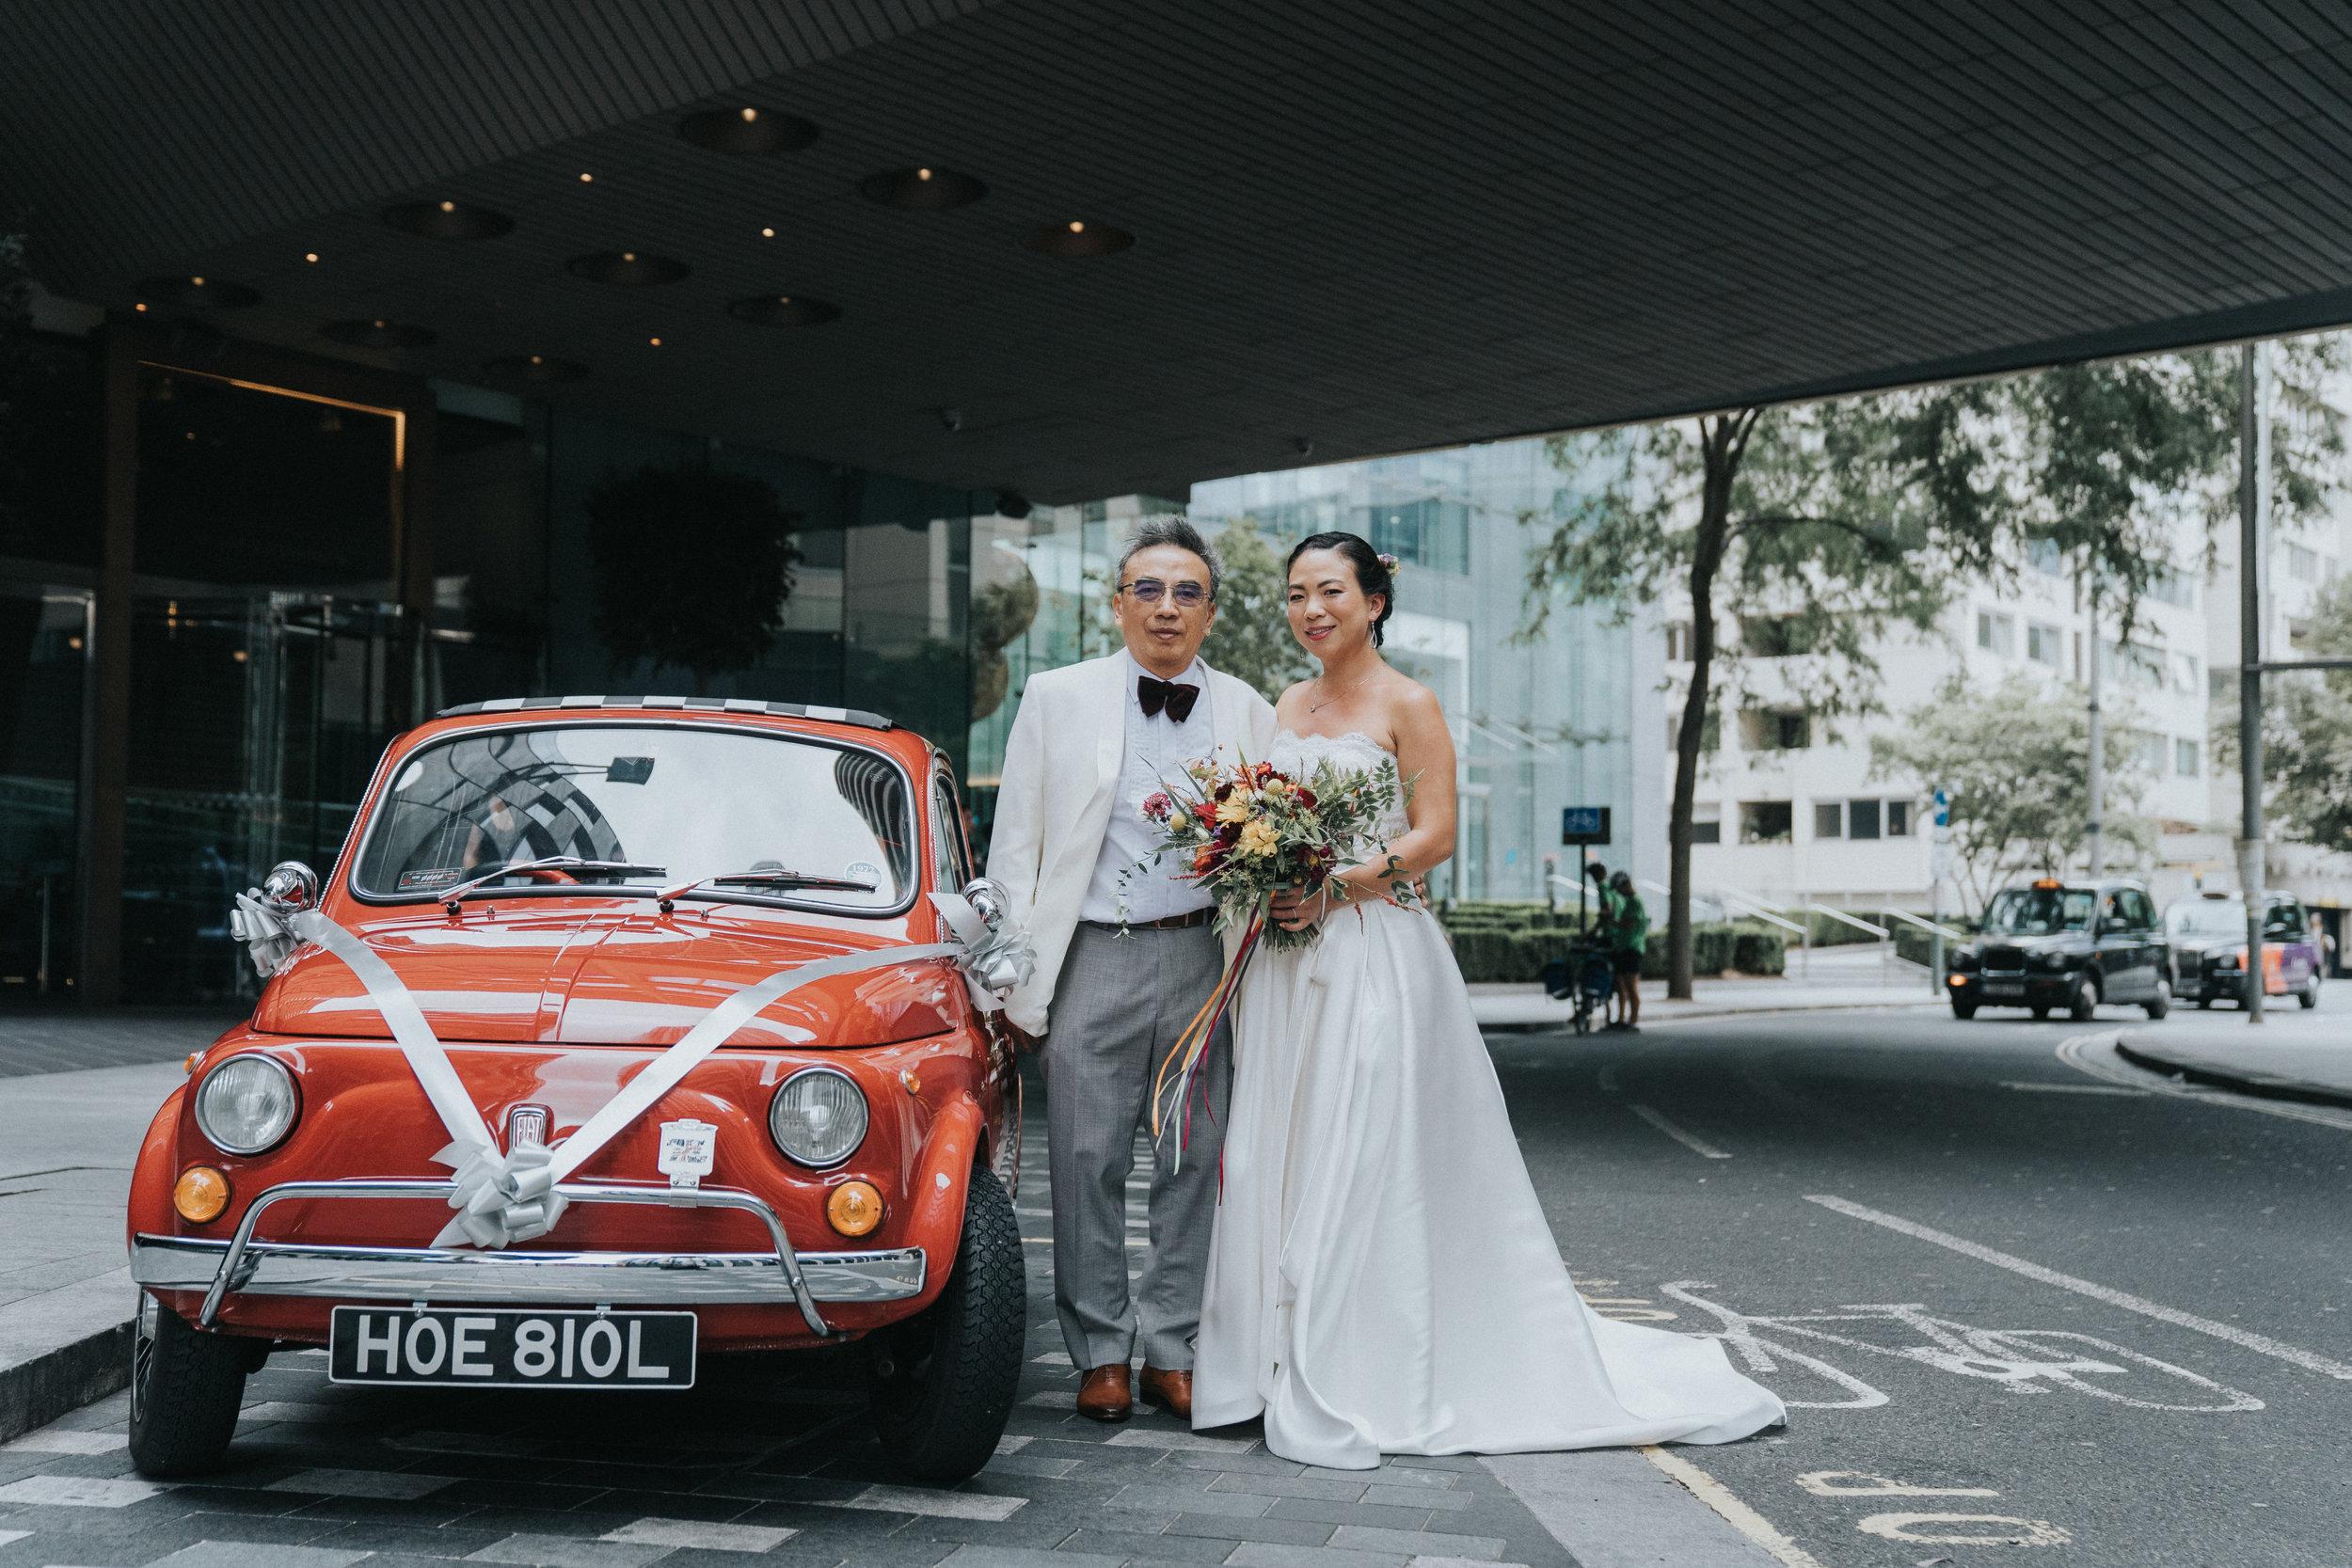 river-rooms-blackfriars-london-stpauls-mondrian-hotel-wedding-photography-videography-25